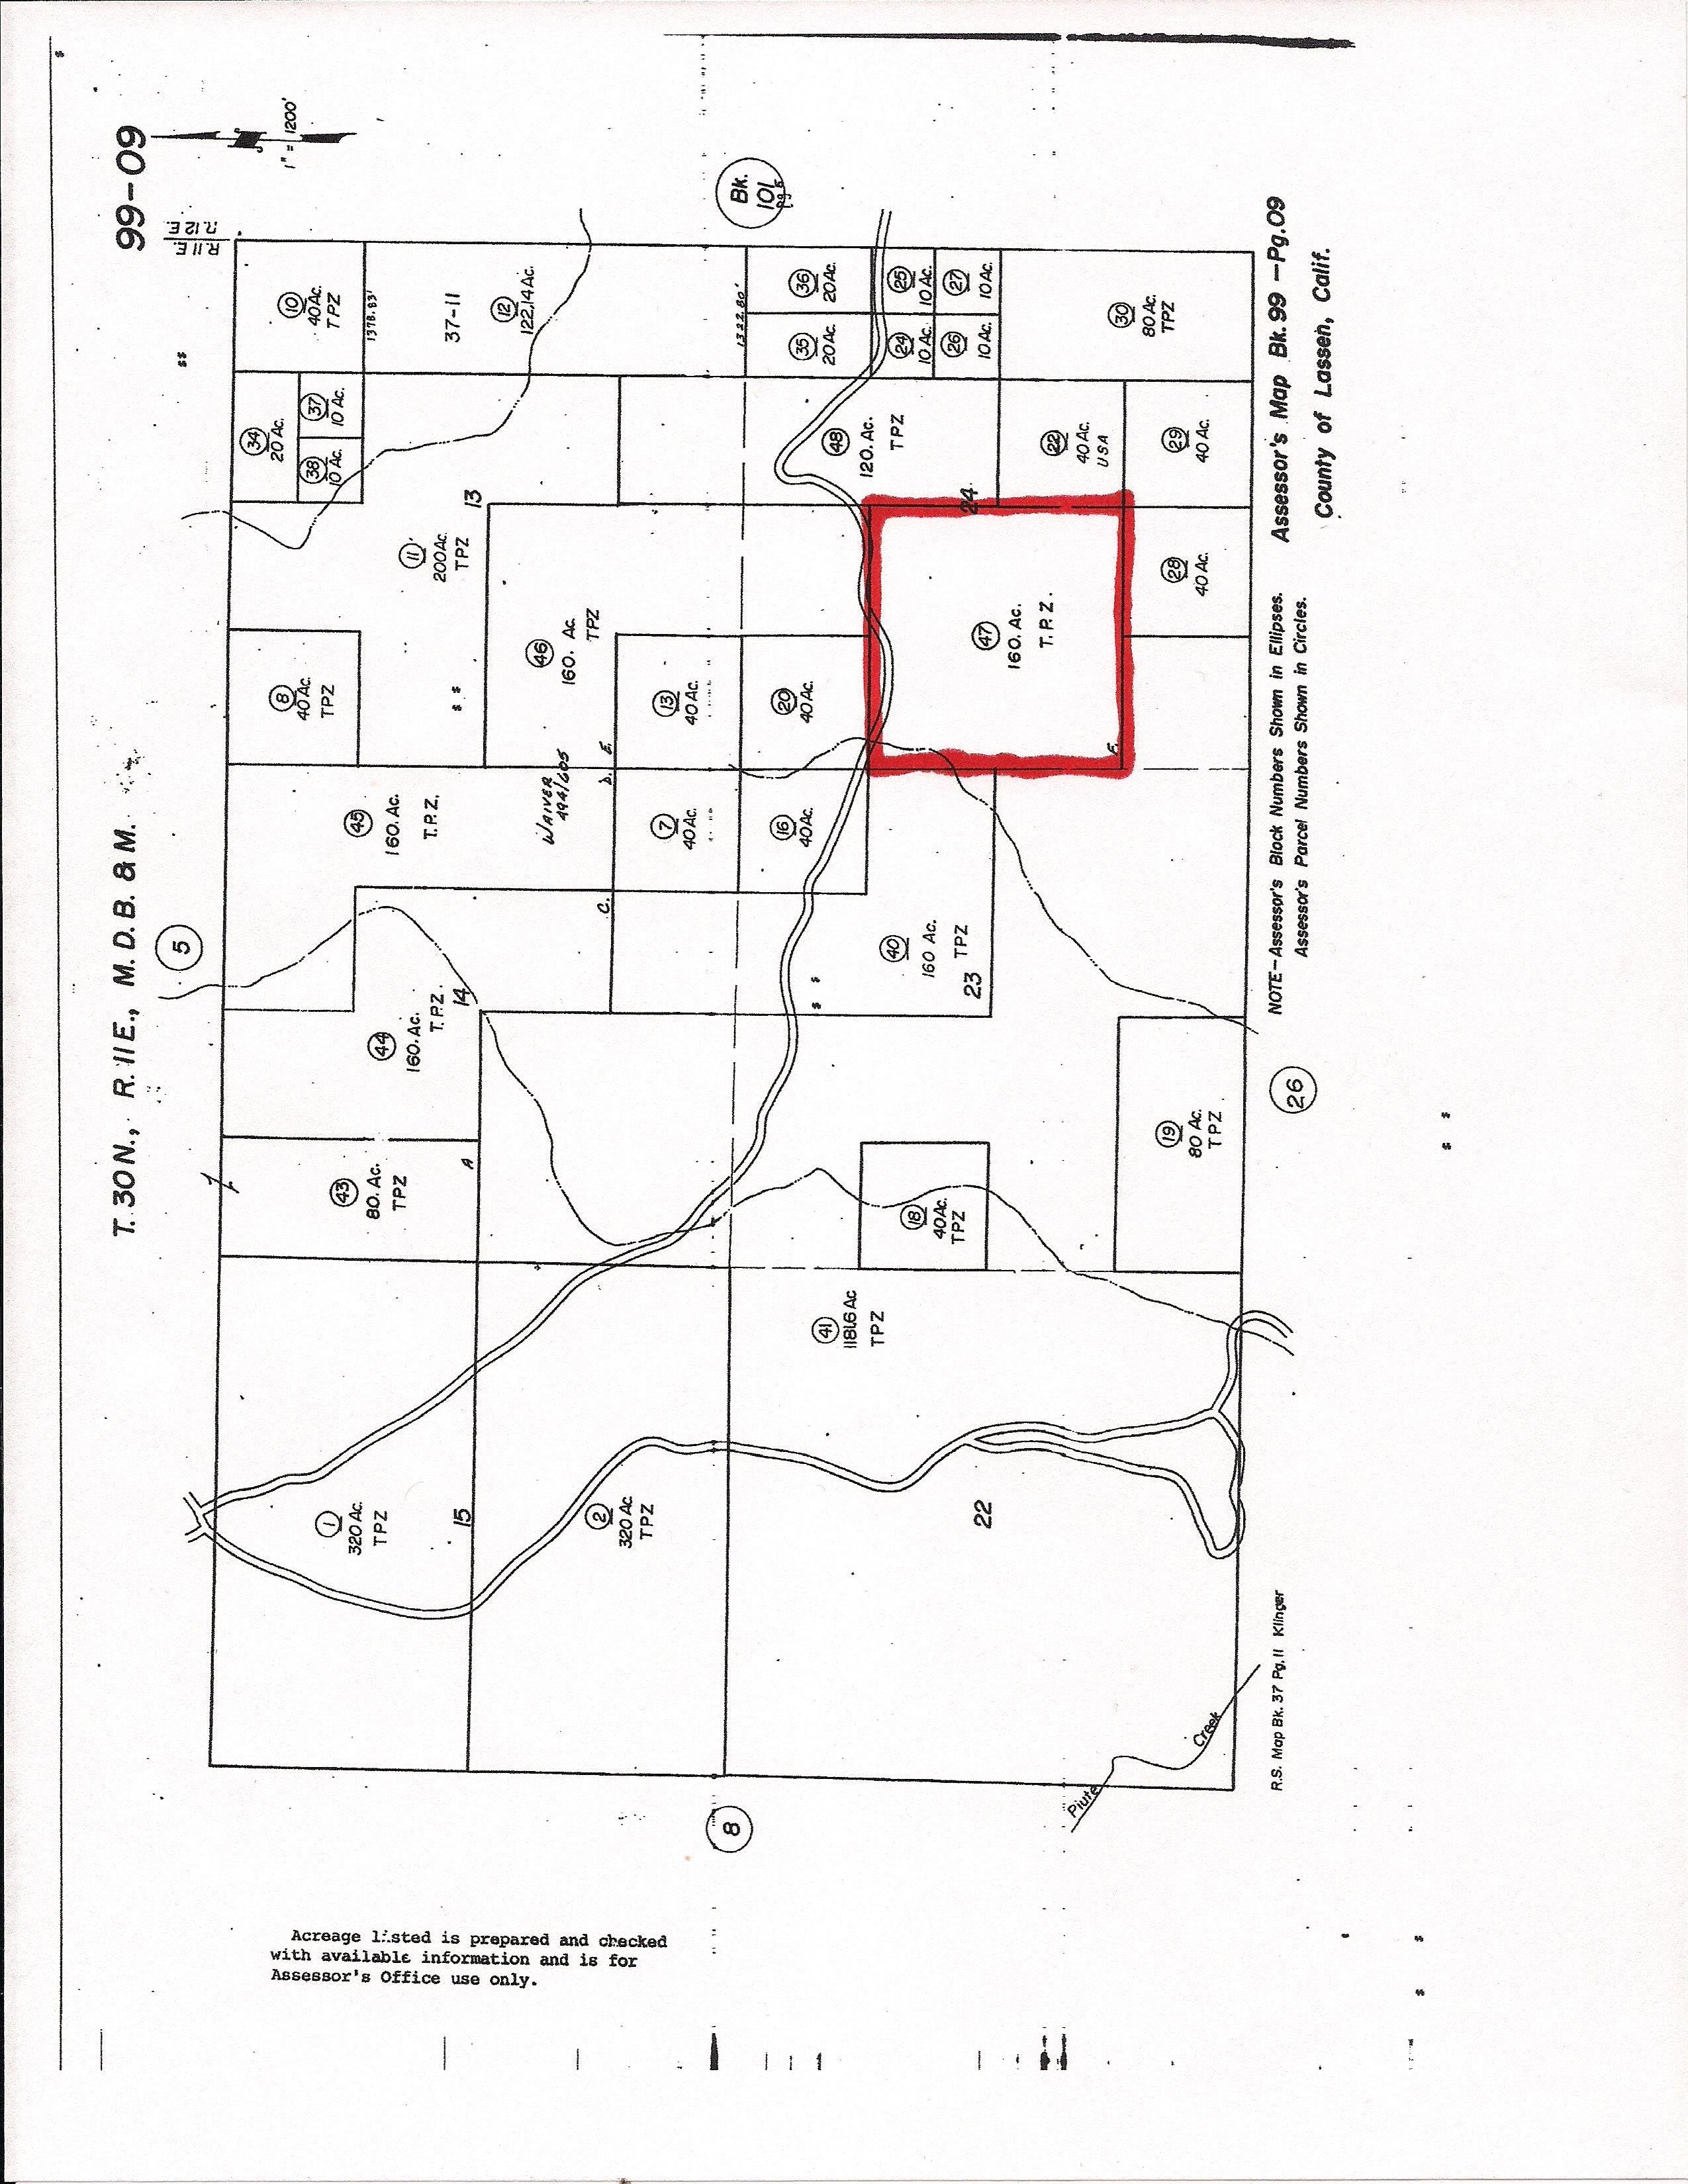 Paiute Lane Lassen County Susanville CA Timber Properties